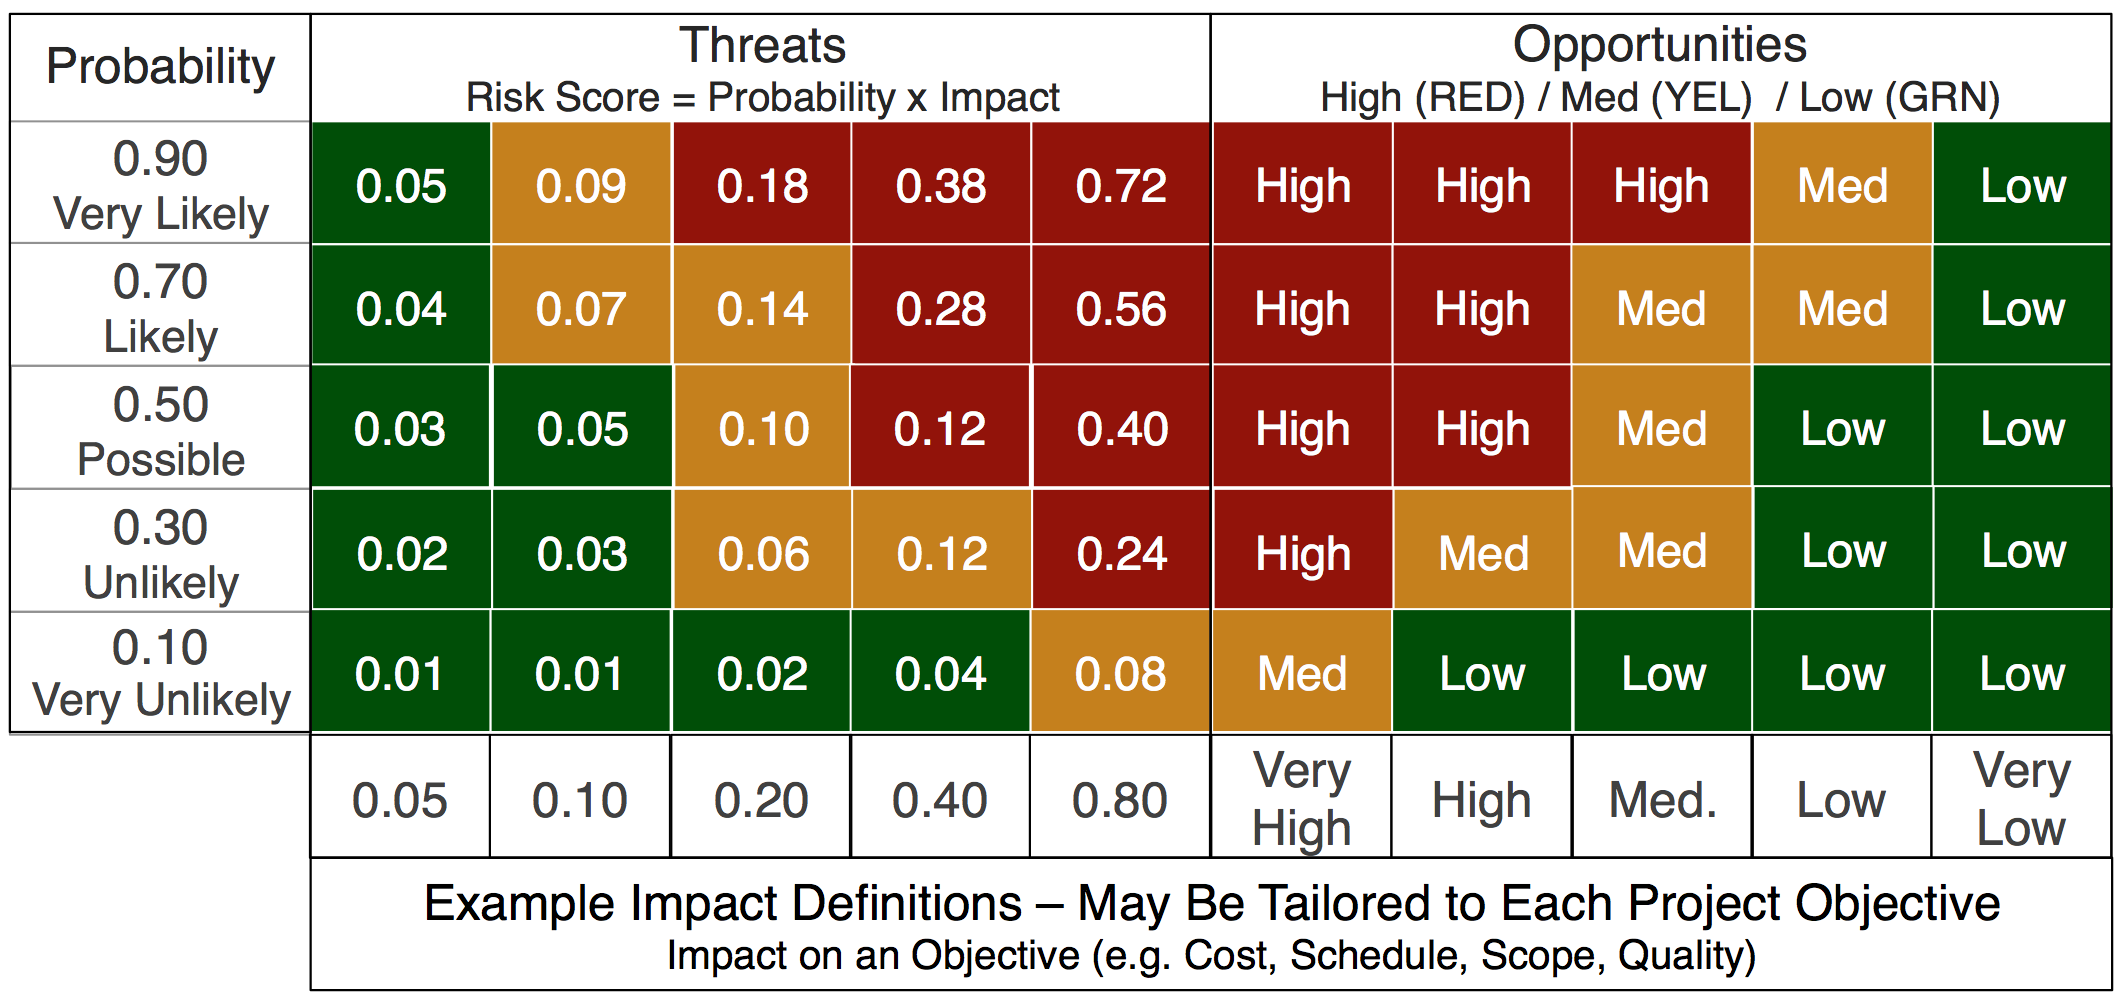 RiskMGMT - Impact-Probability-Matrix-Heat-Map-Risk-Management-Mitigation